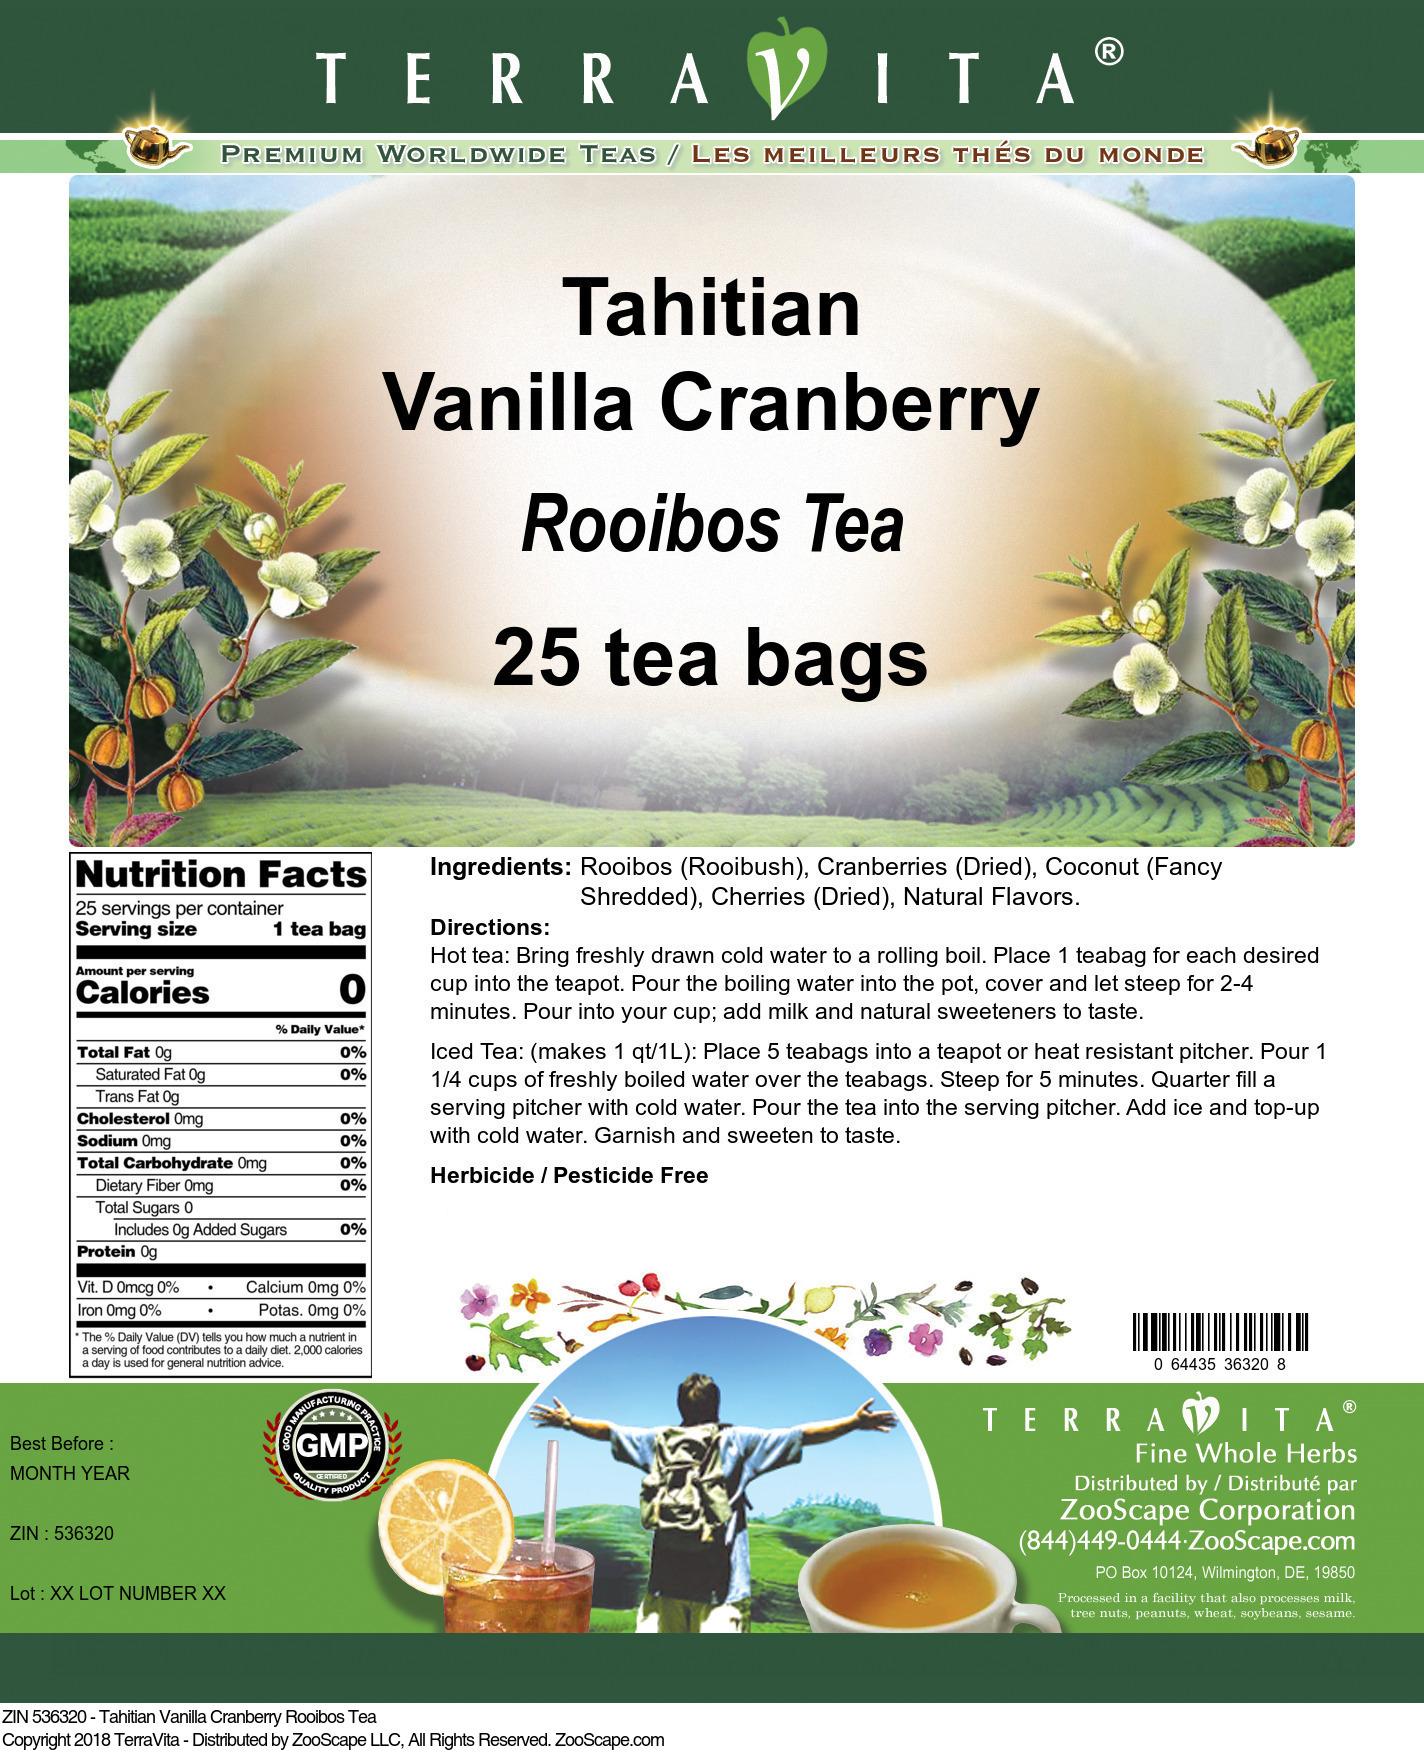 Tahitian Vanilla Cranberry Rooibos Tea